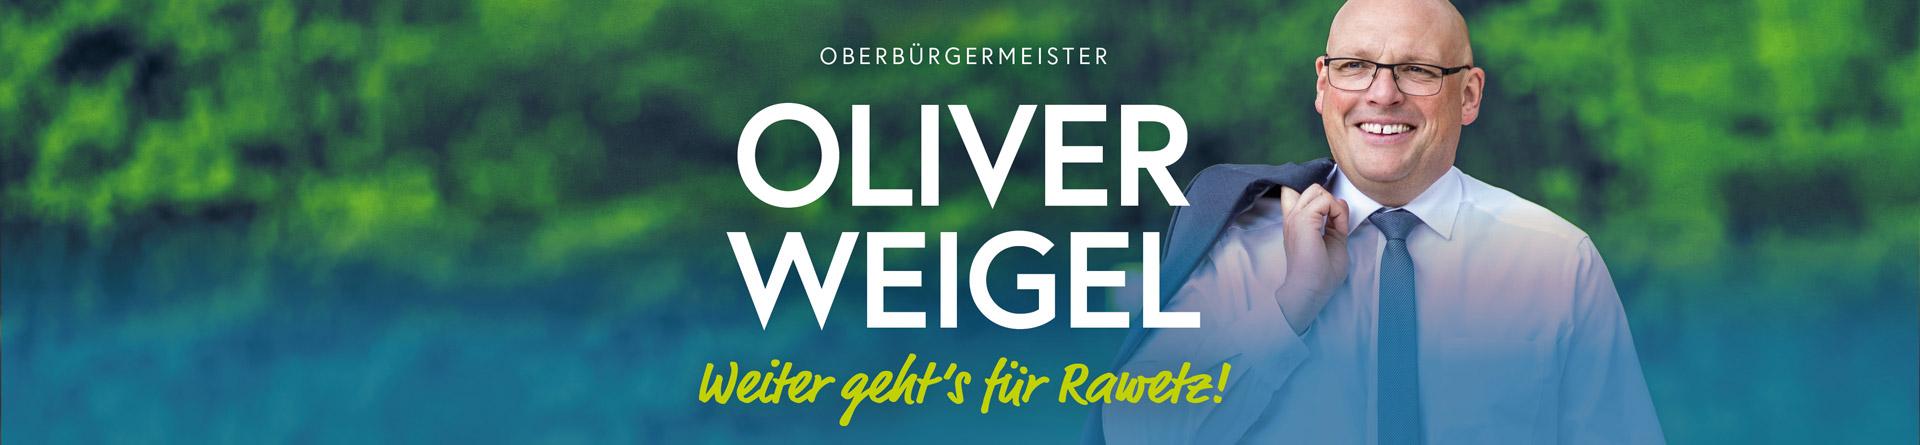 Oliver_Weigel_1920x445px